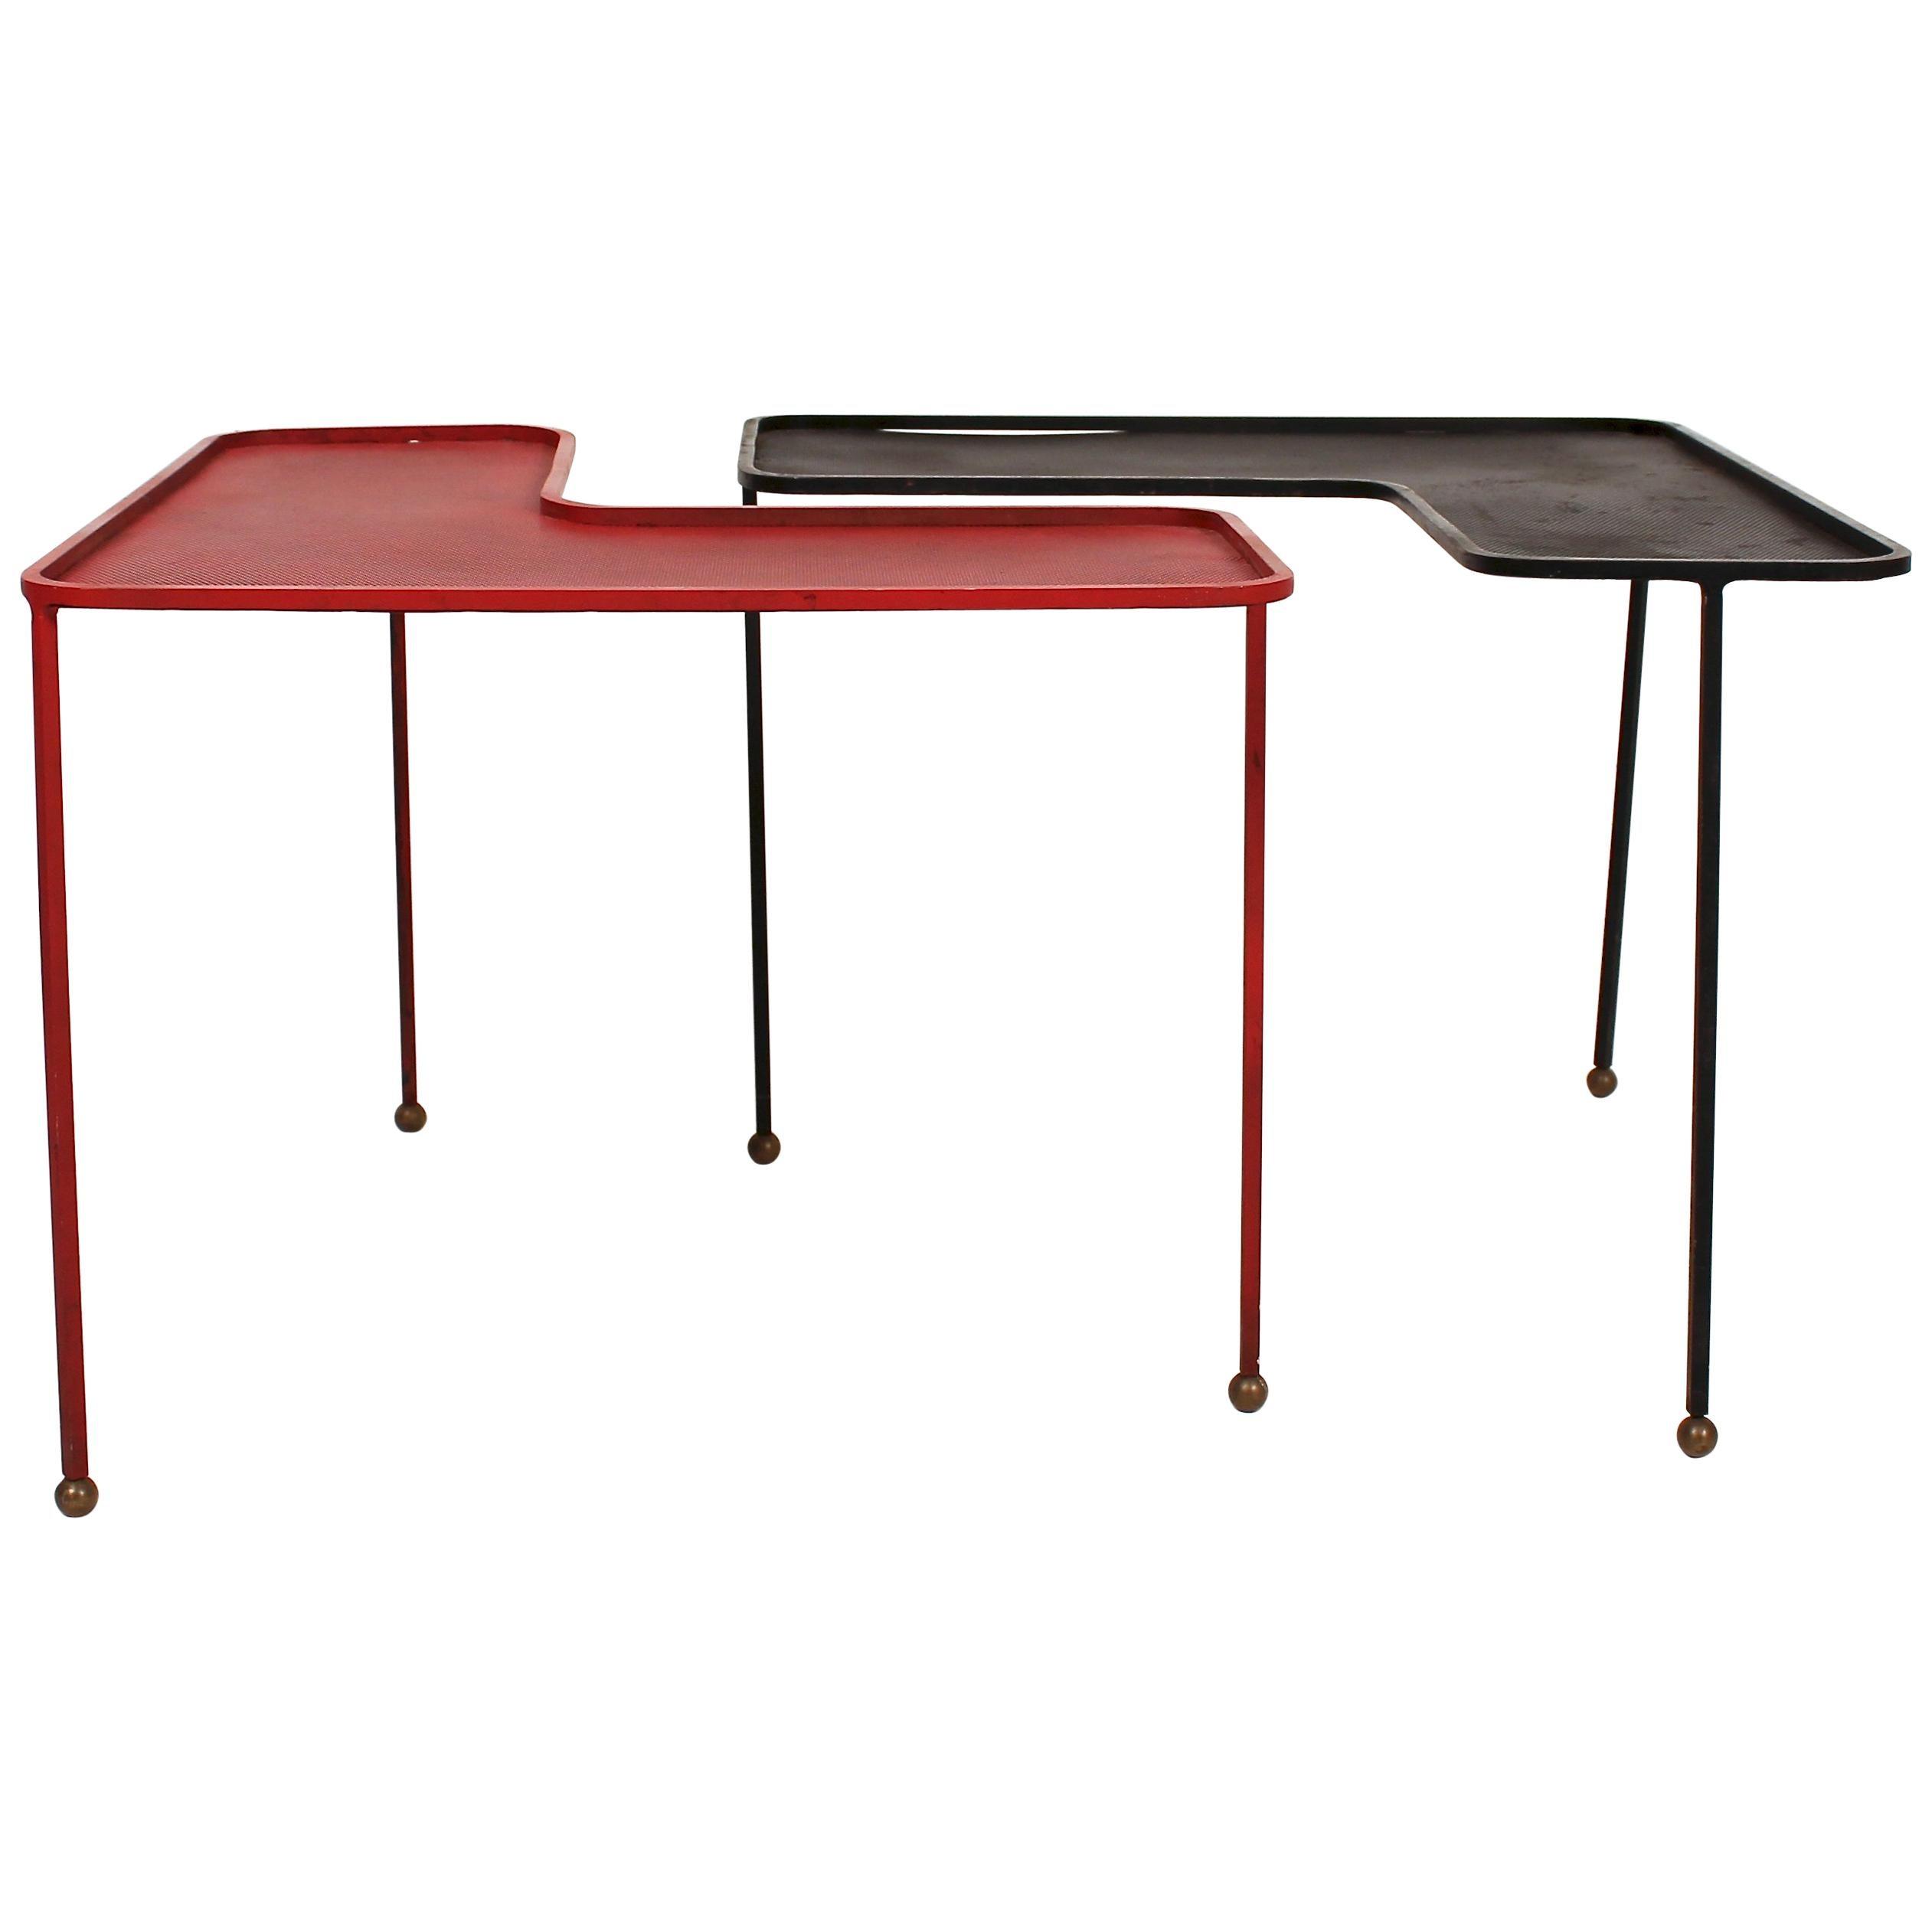 Pair of Domino Tables by Mathieu Matégot, 1953